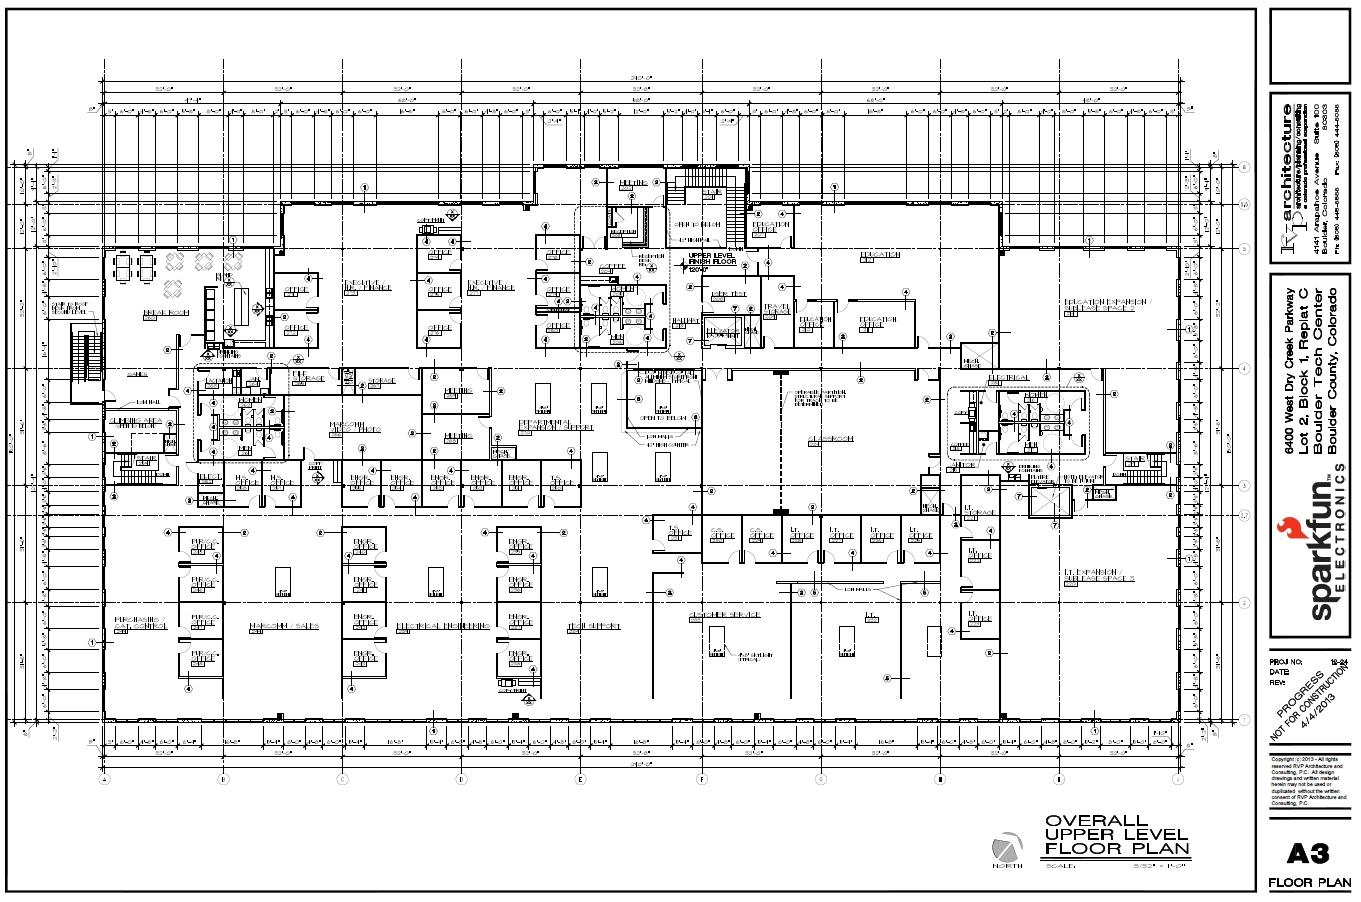 HY_6579] Building Management System Wiring Diagram Wiring DiagramElae Inoma Mopar Wedab Wigeg Mohammedshrine Librar Wiring 101